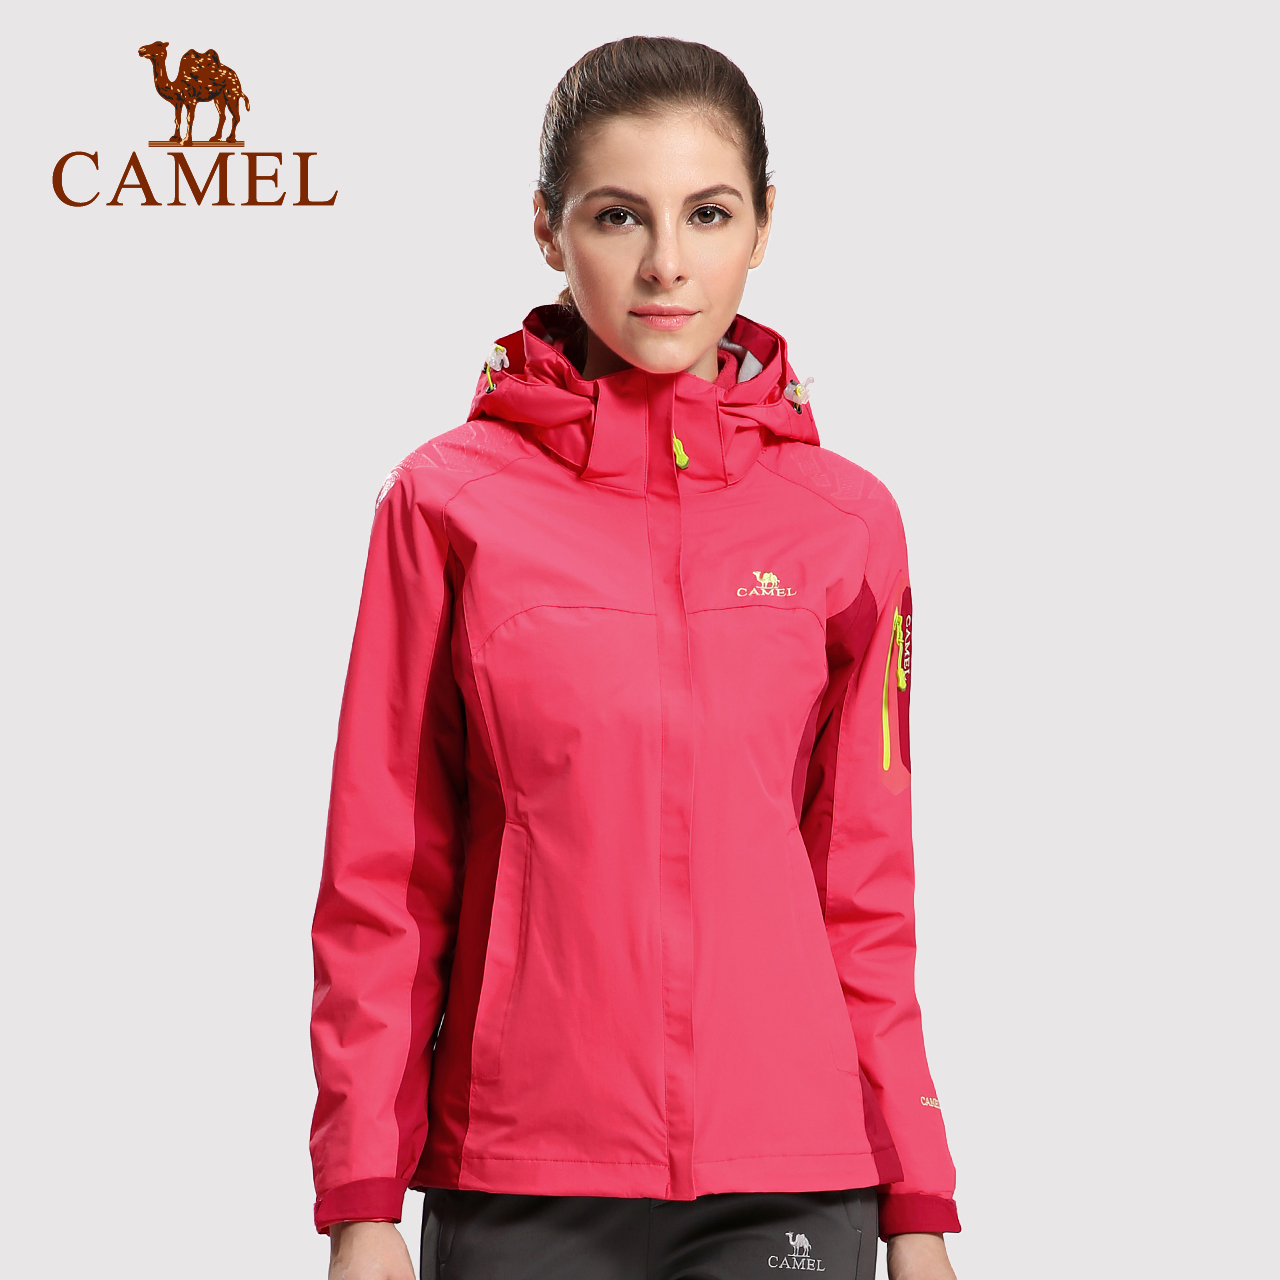 CAMEL骆驼户外冲锋衣 三合一 两件套加绒加厚登山服男女户外服冬